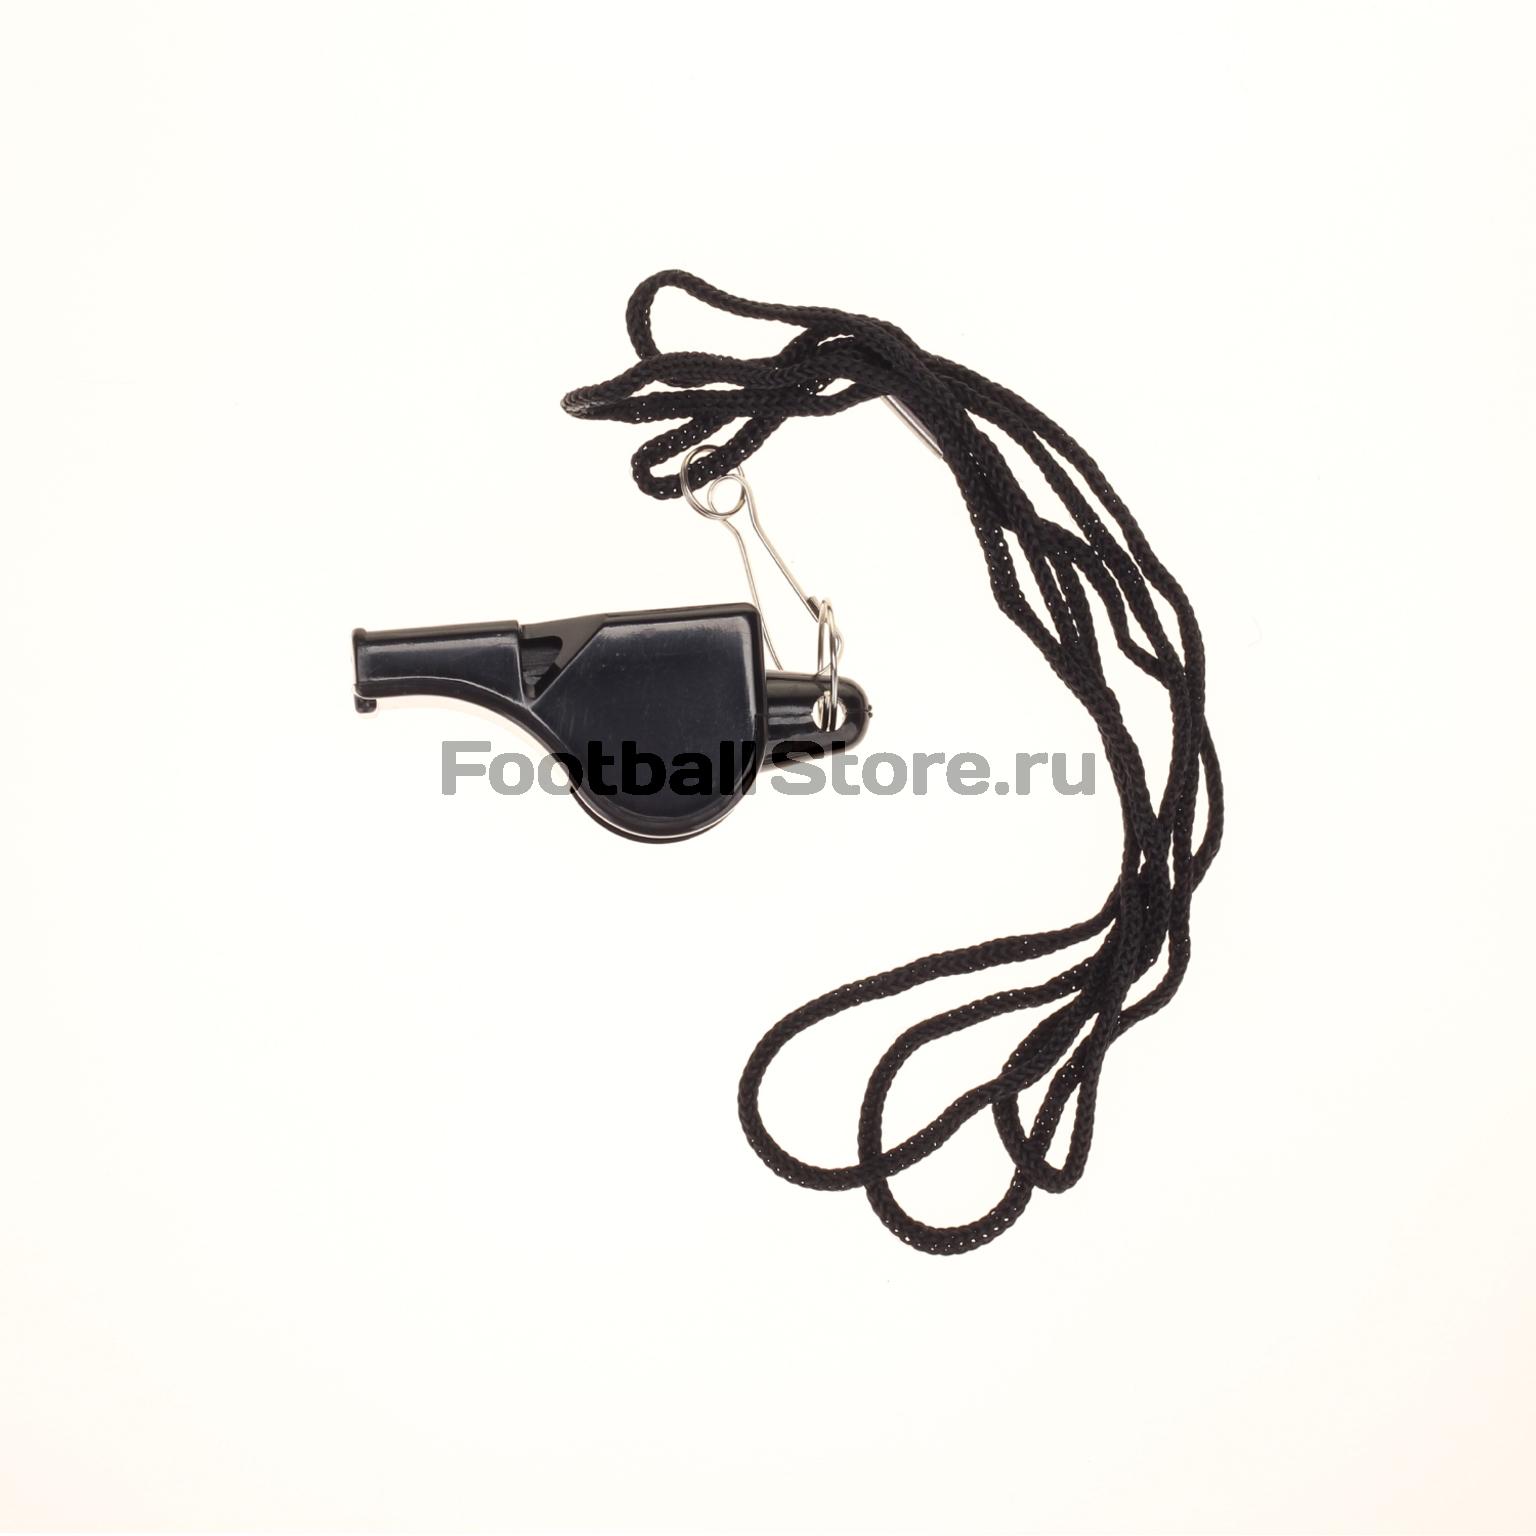 Свисток на шнурке Mad Guy 01-15-003-P недорго, оригинальная цена